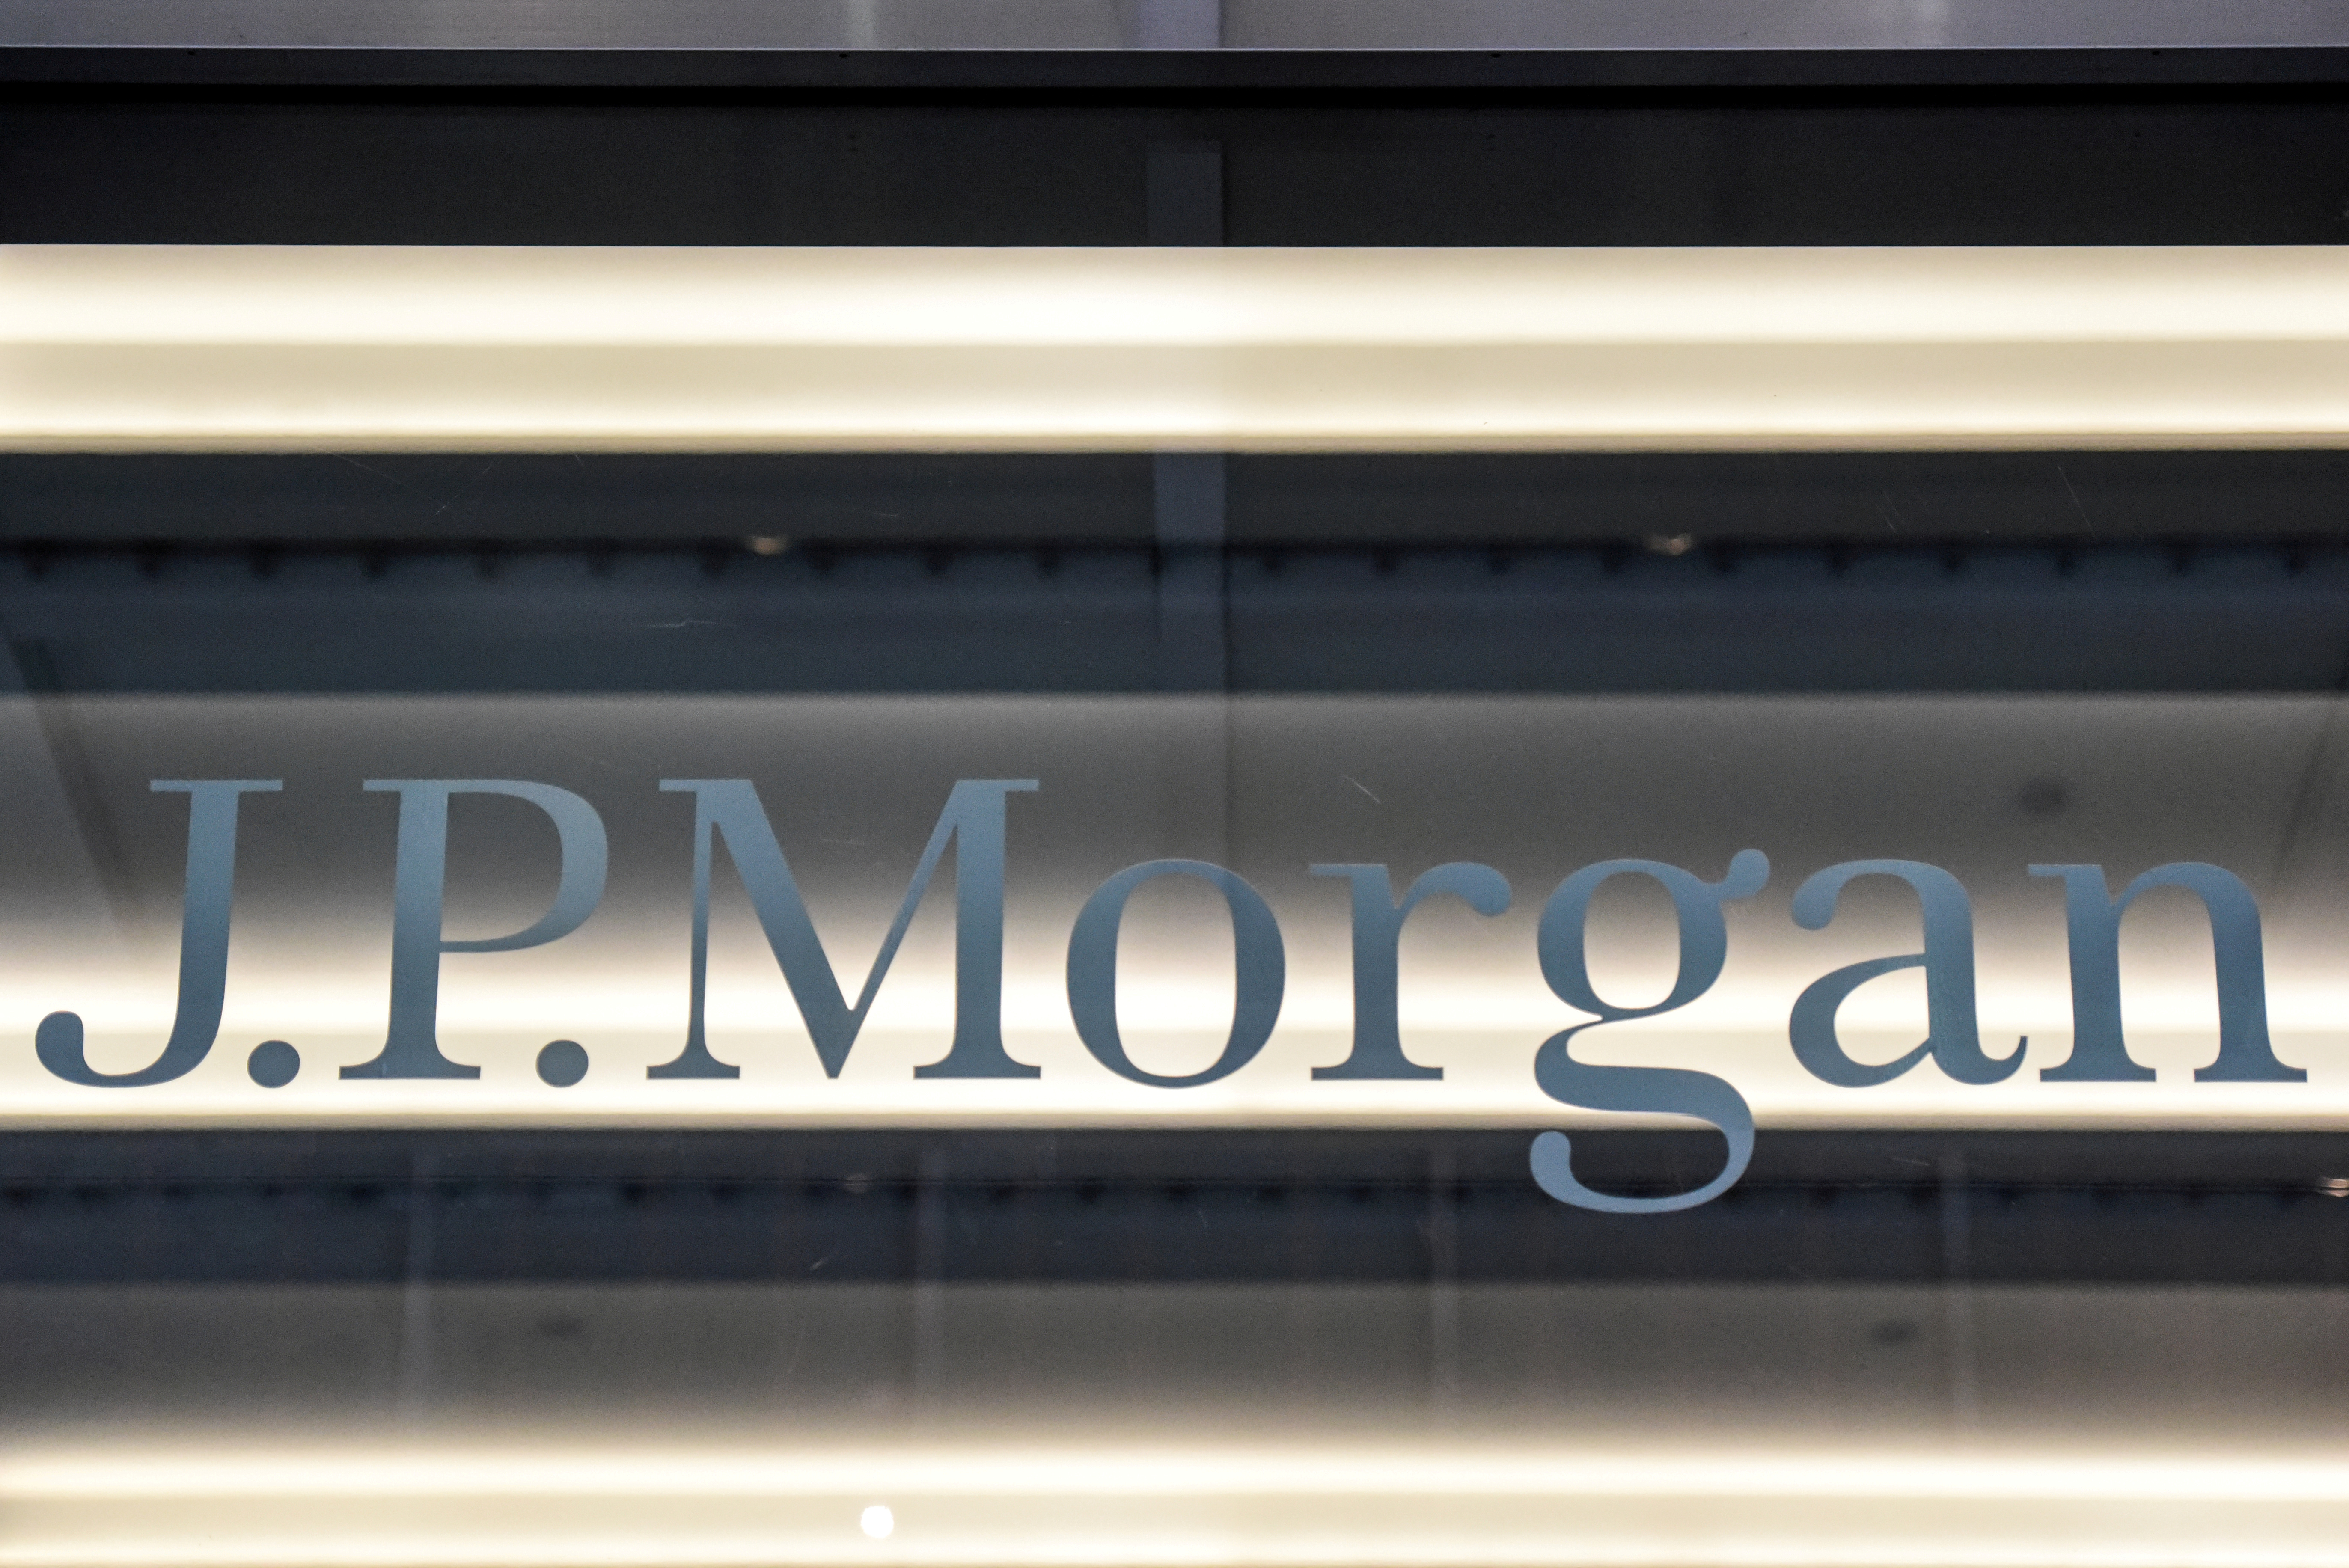 A J.P. Morgan logo is seen in New York City, U.S., January 10, 2017. REUTERS/Stephanie Keith/File Photo